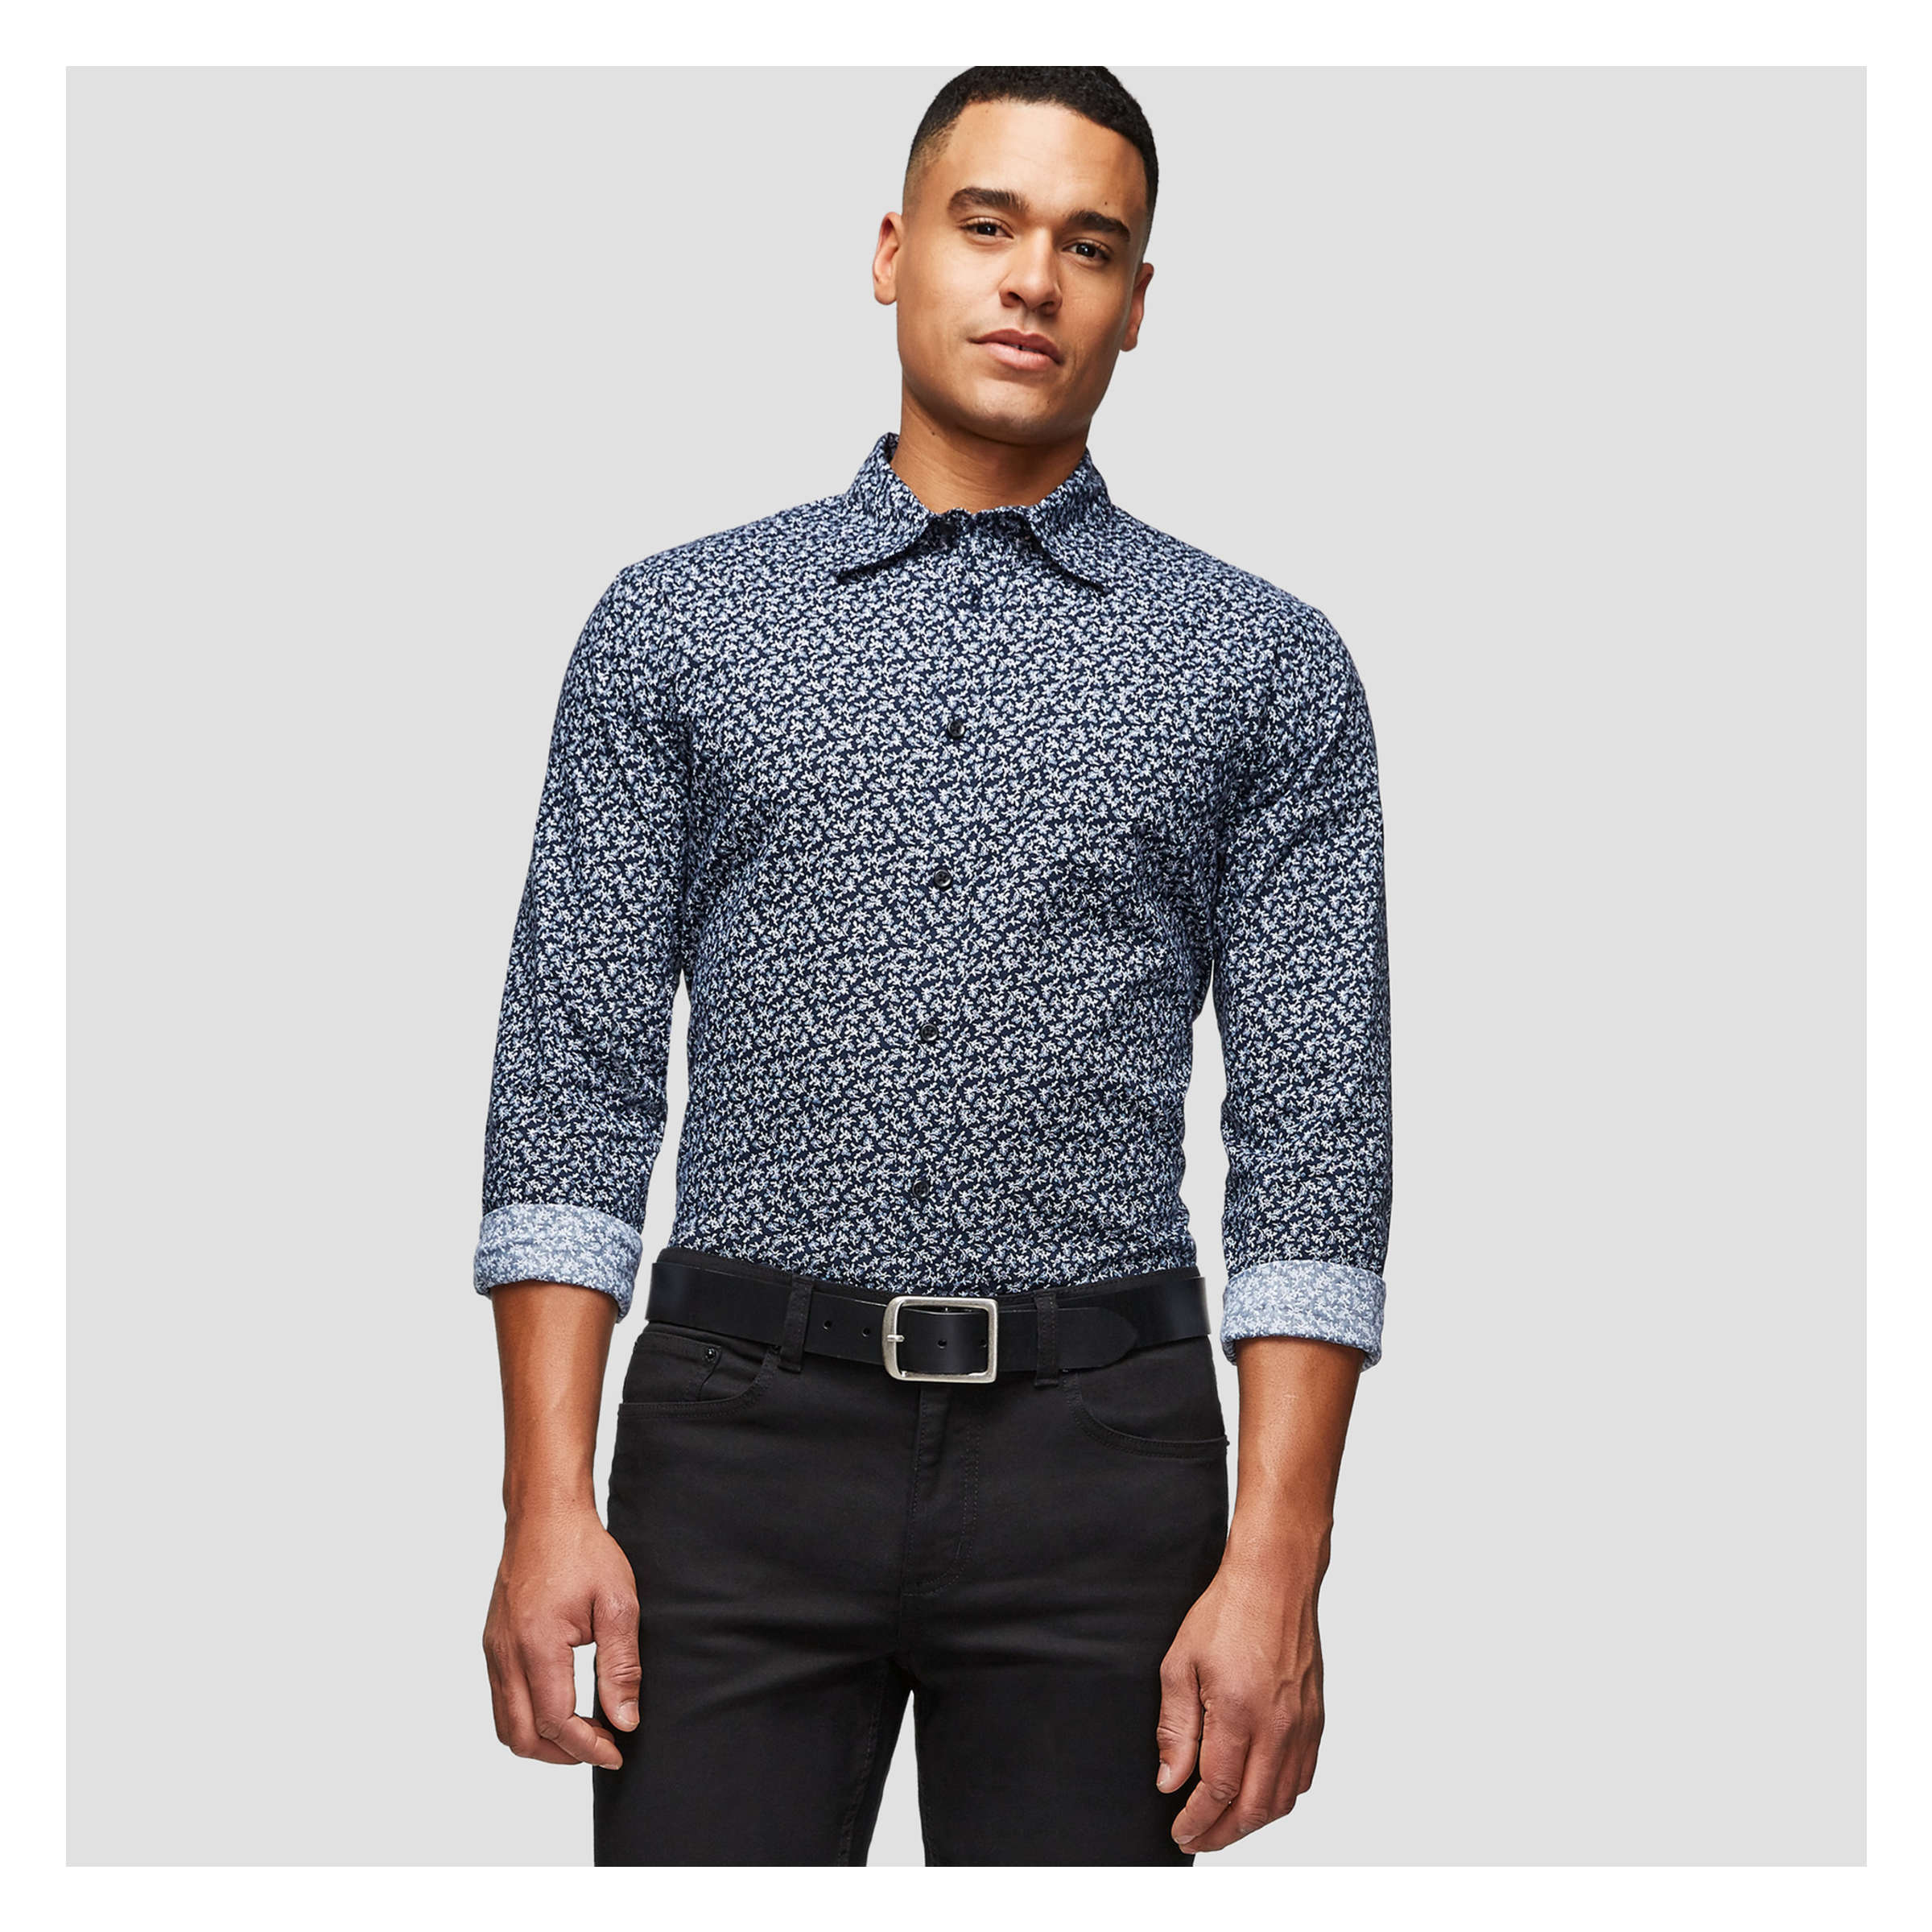 Mens Long Sleeve Print Shirt In Jf Midnight Blue From Joe Fresh